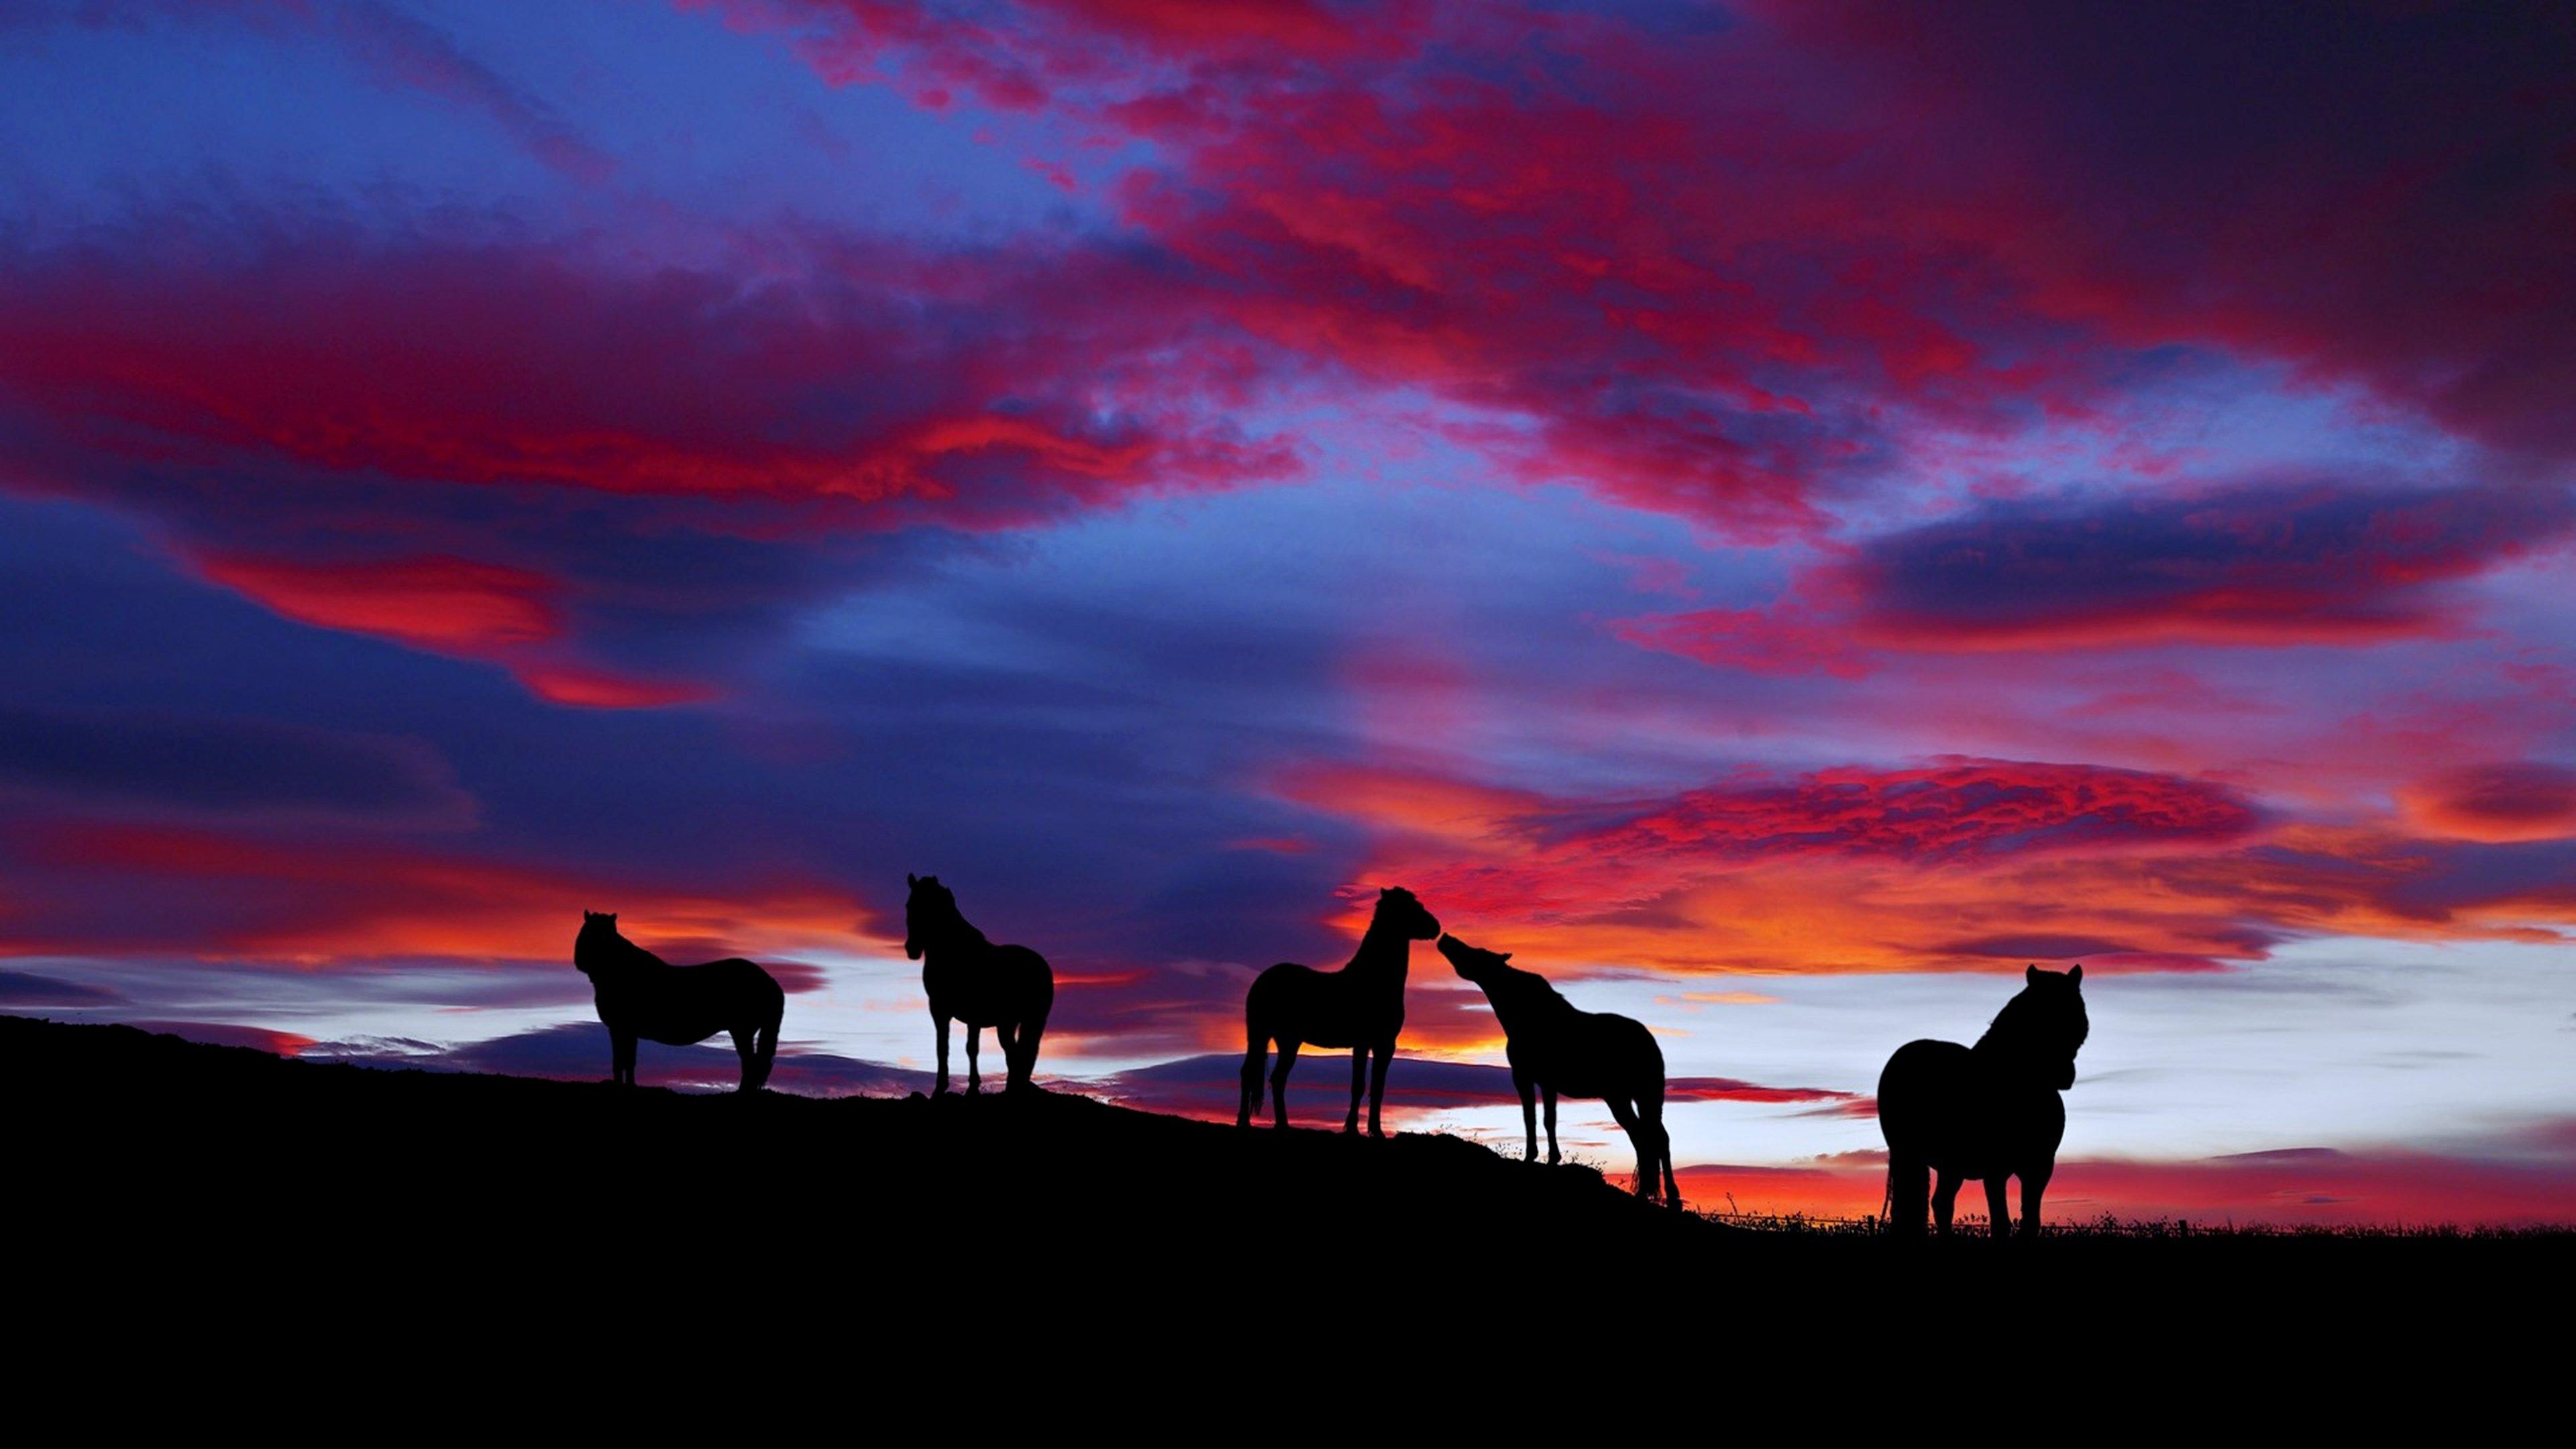 sunset horses cloud landscape nature wild wallpaper